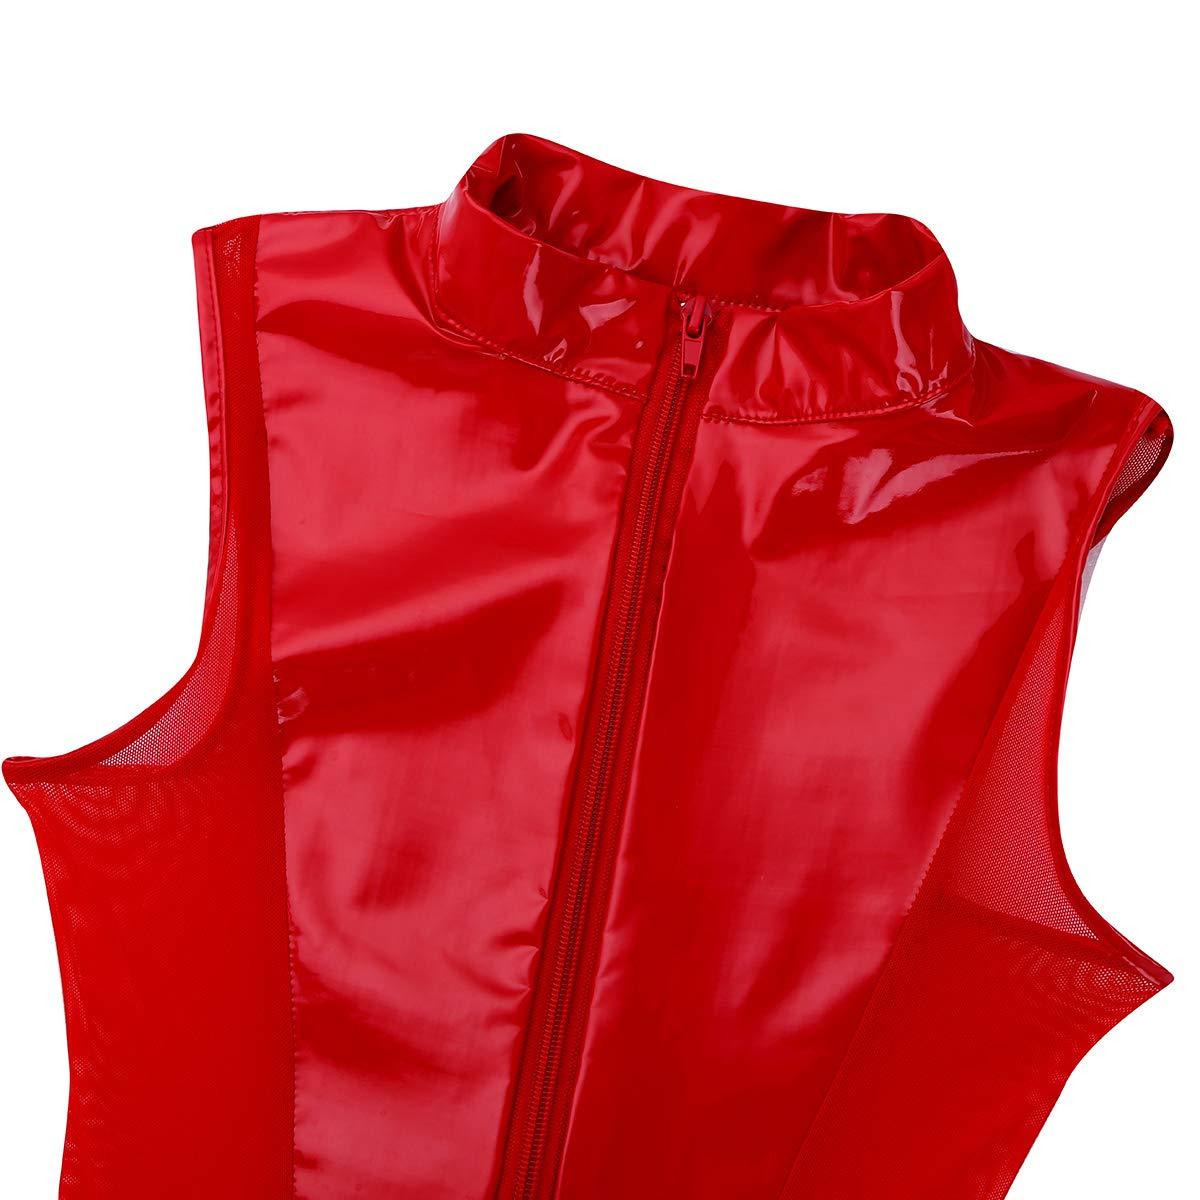 Agoky Womens Metallic Leather Sleeveless Bodysuit Zipper High Cut Thongs Leotard Clubwear FXD10062281-10059101-UK